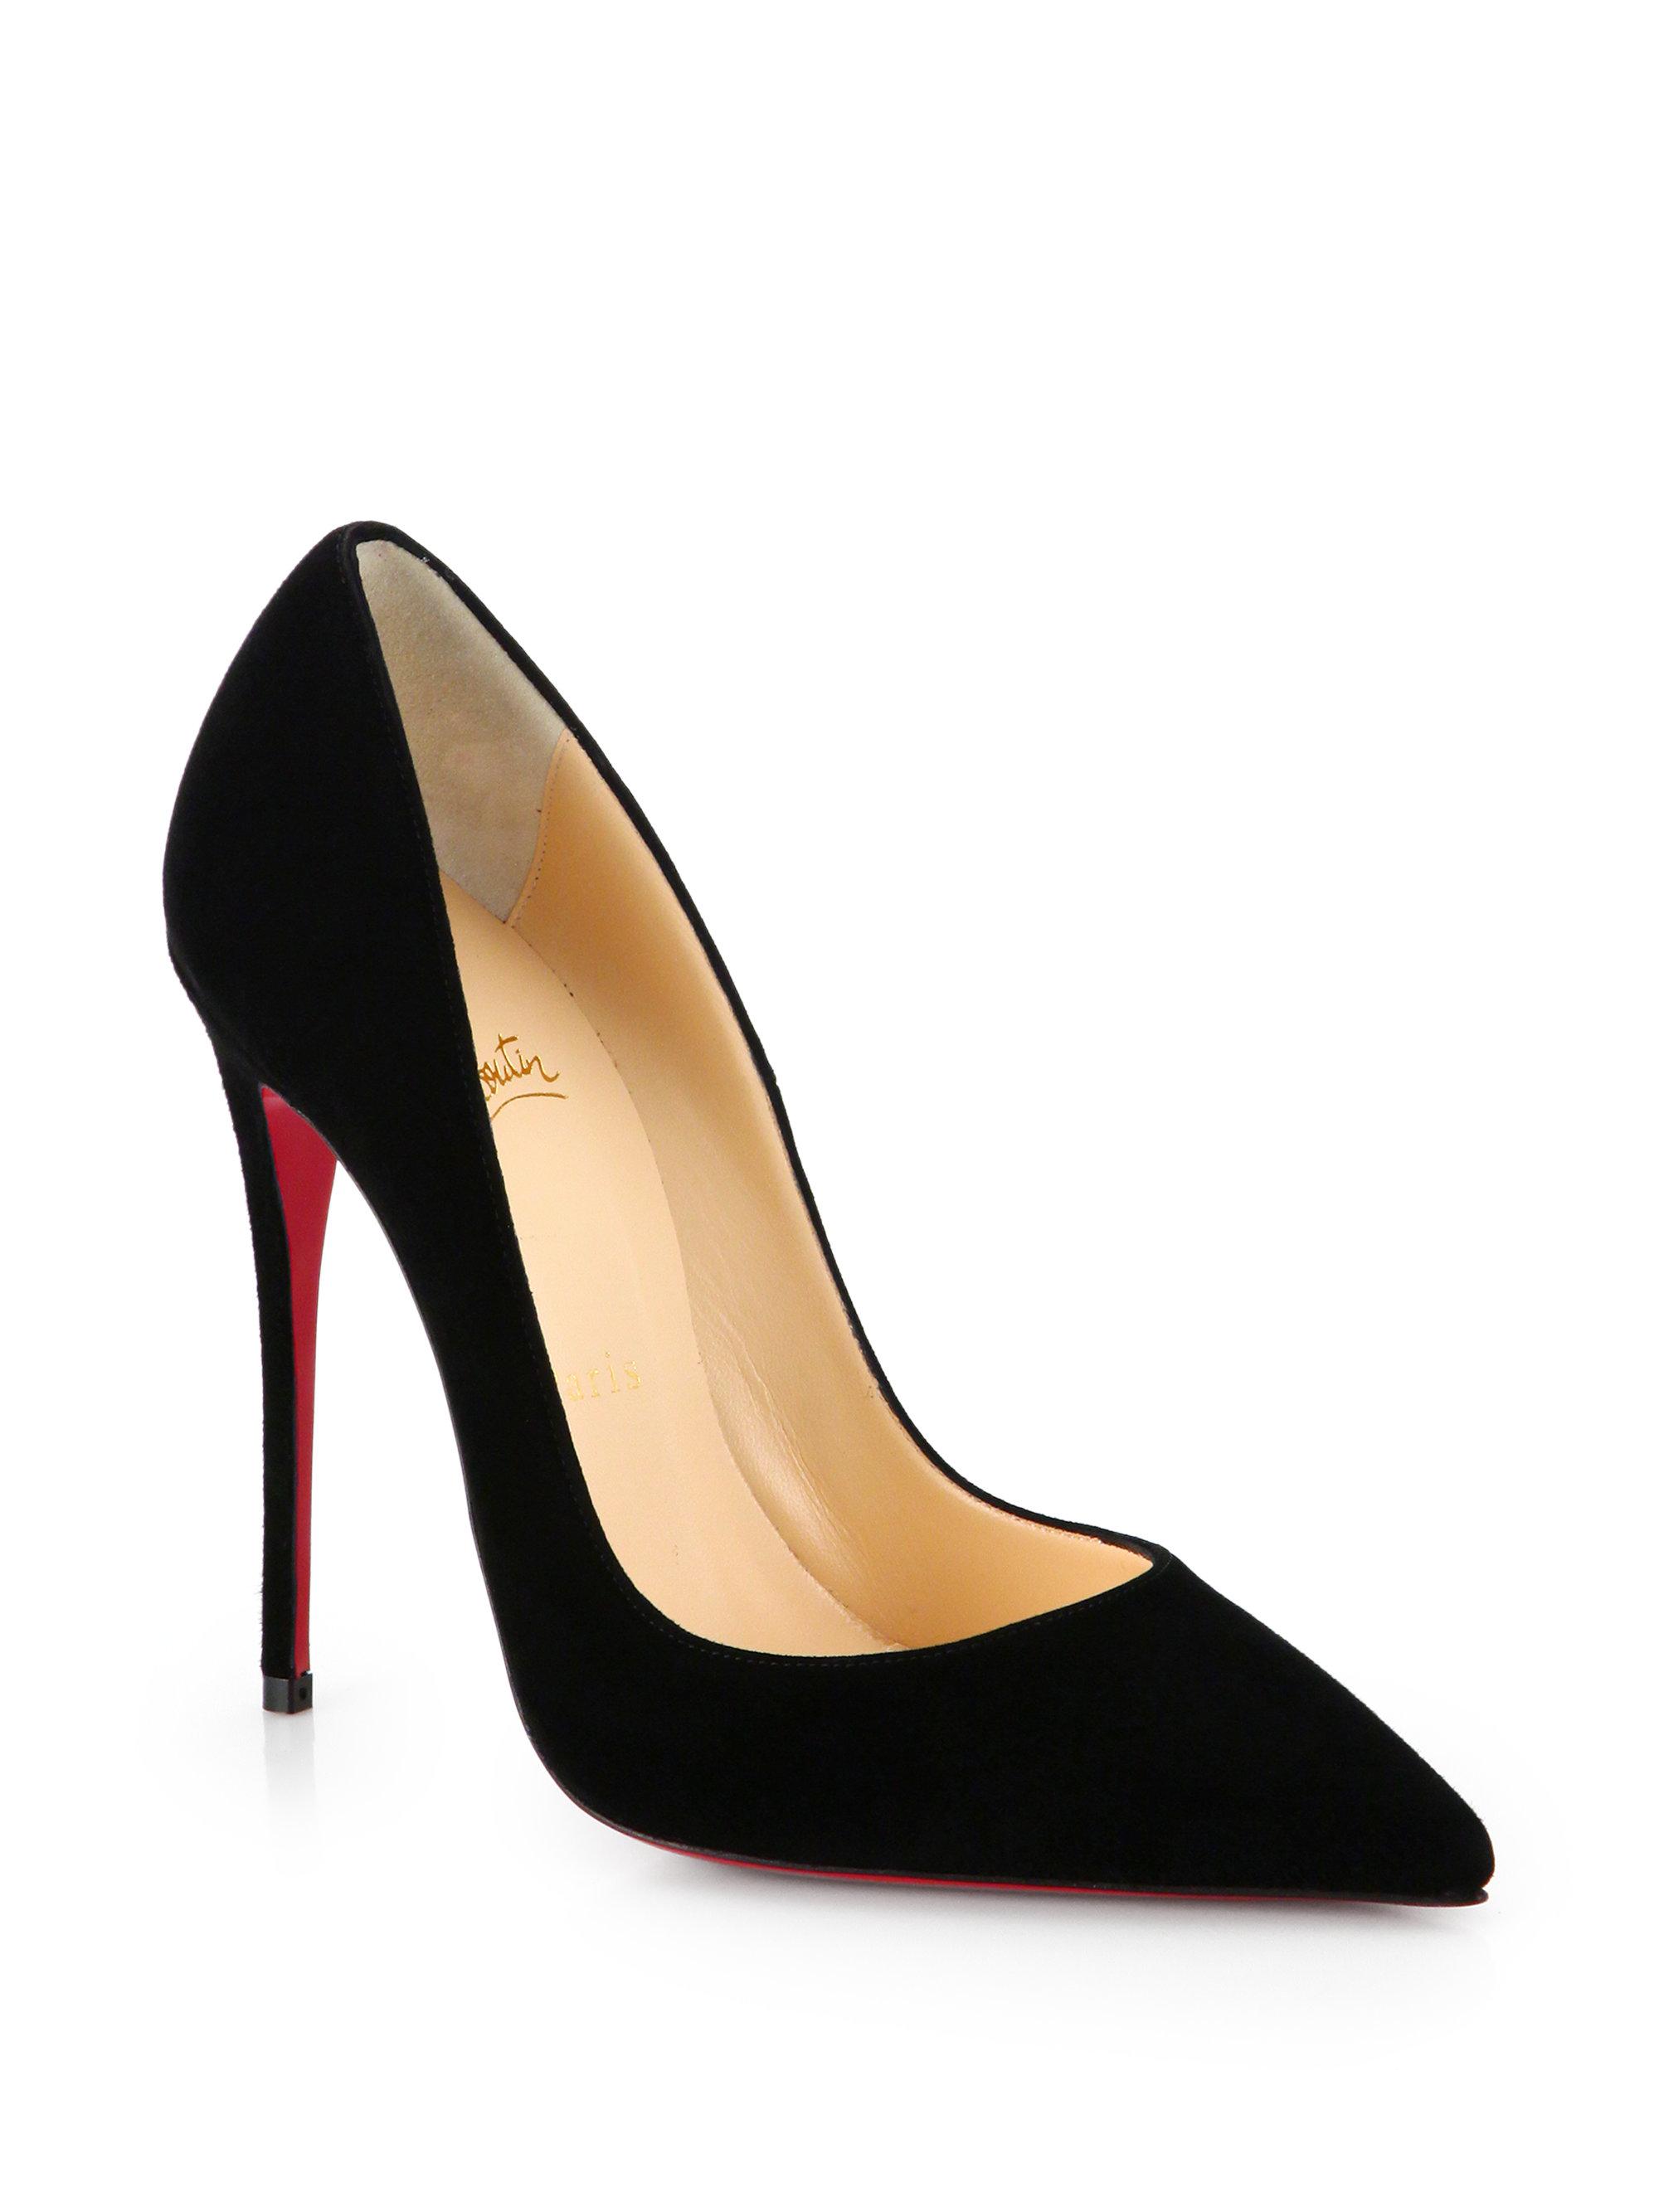 Low Point Court Shoes Sale Uk